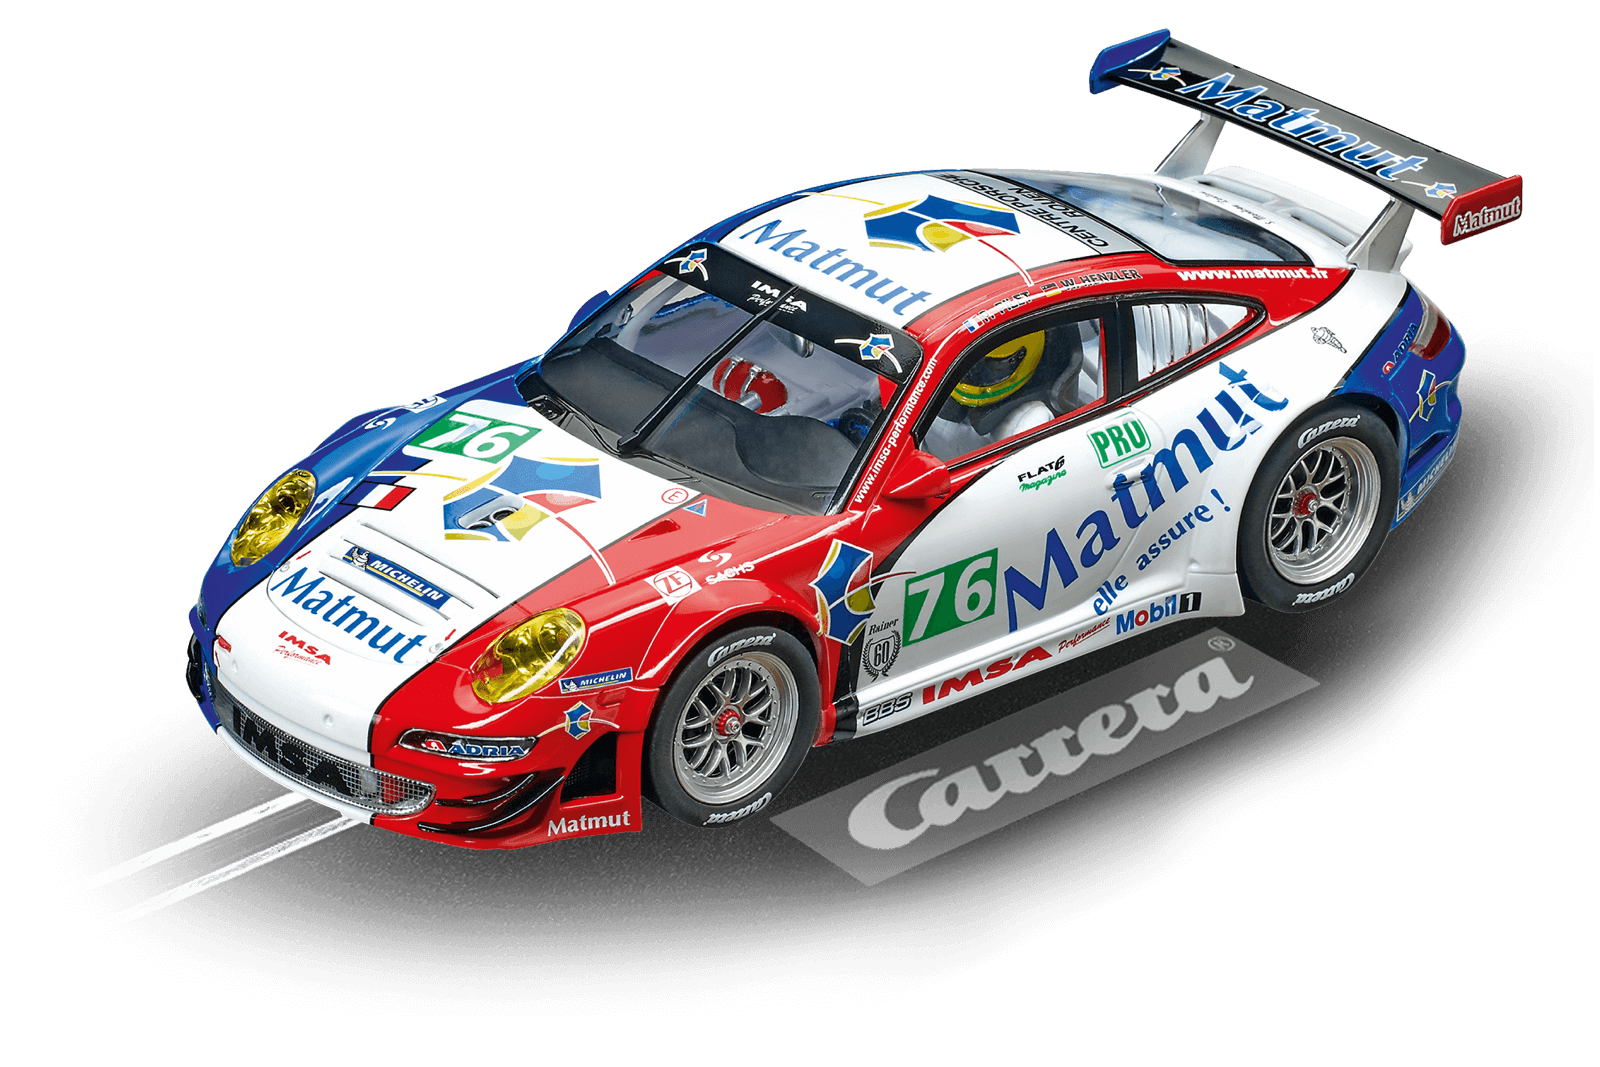 Top Tuning Carrera 124 Digitale - Porsche Gt3 Rsr   Matmut   No.76 come 23863